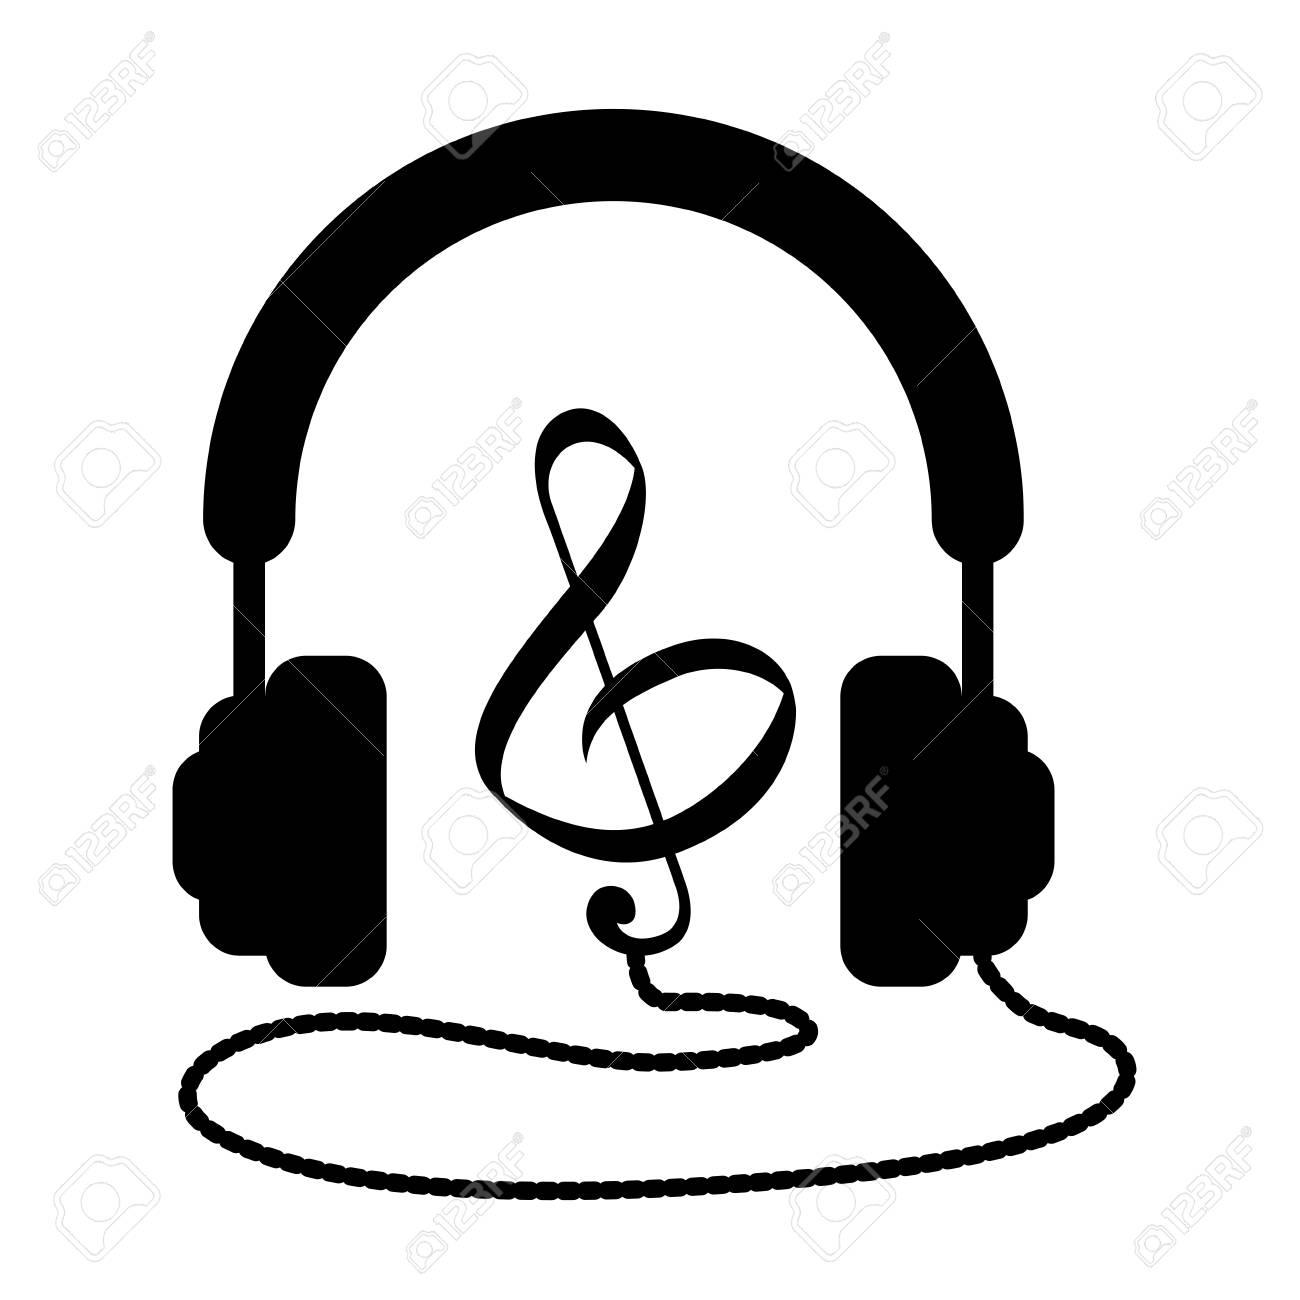 Music note symbol icon vector illustration graphic design royalty music note symbol icon vector illustration graphic design stock vector 80157059 biocorpaavc